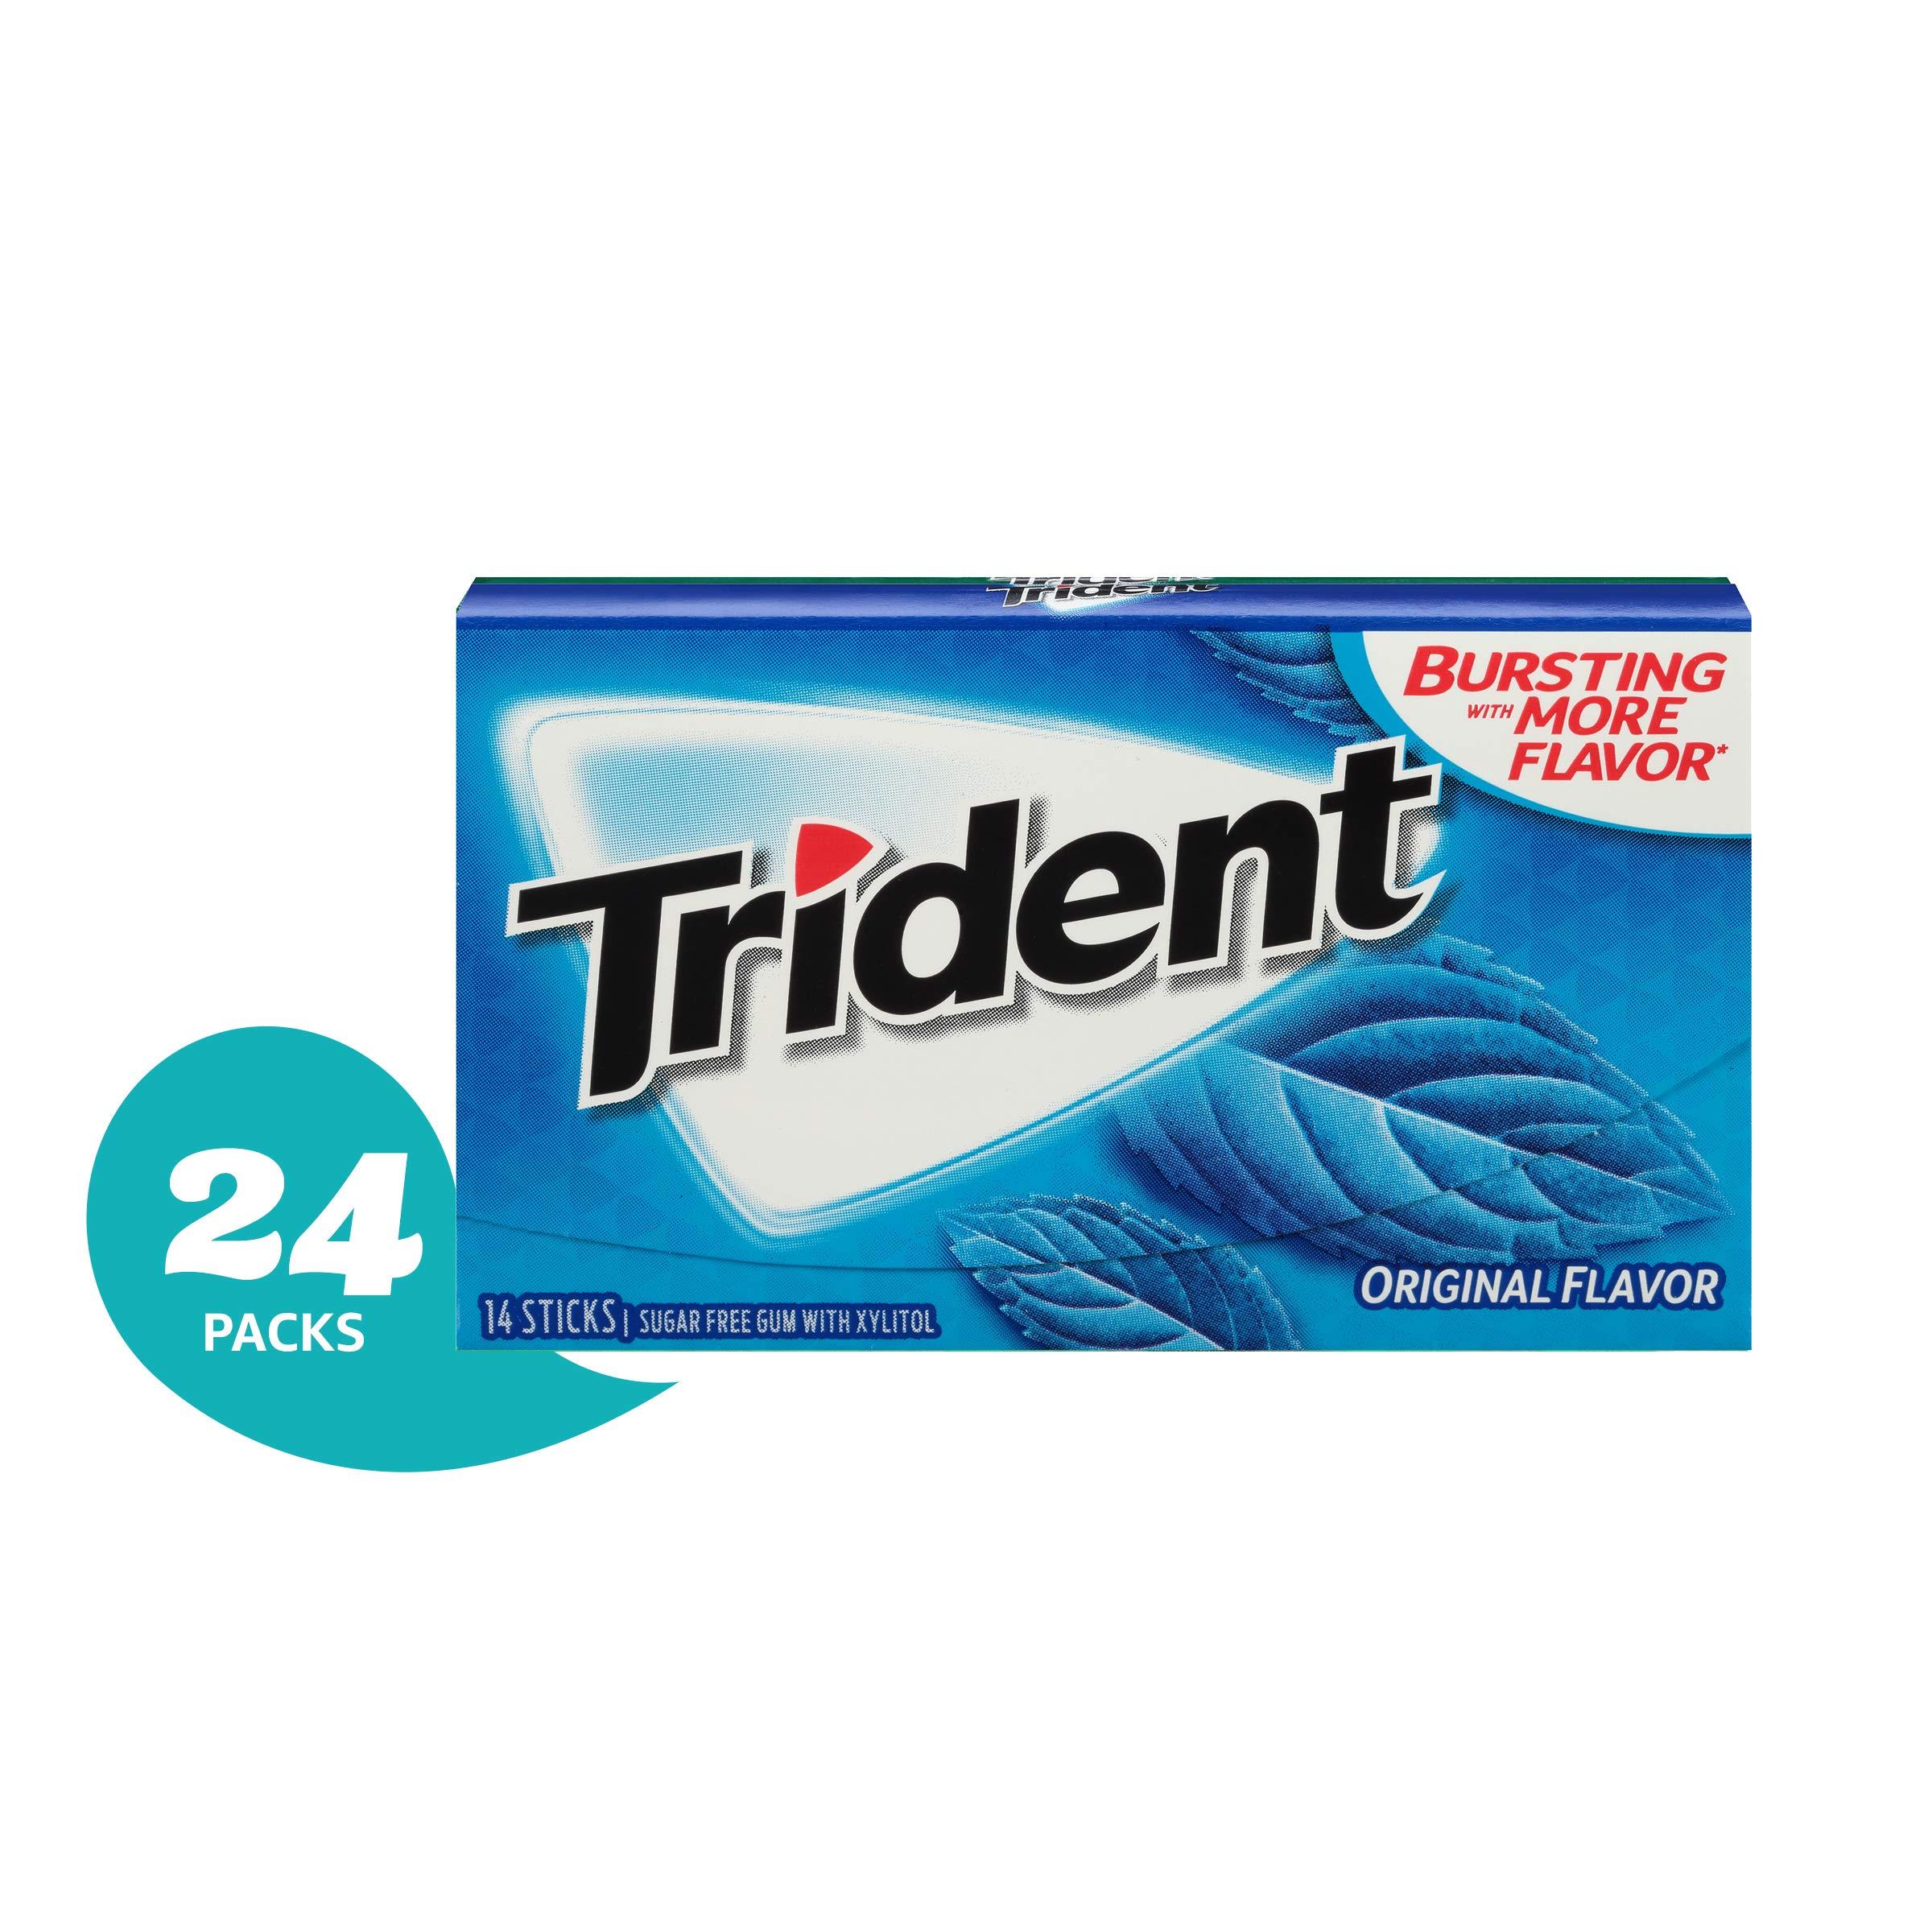 Trident Sugar Free Gum Original, 14 piece pack (24 Packs) by Trident